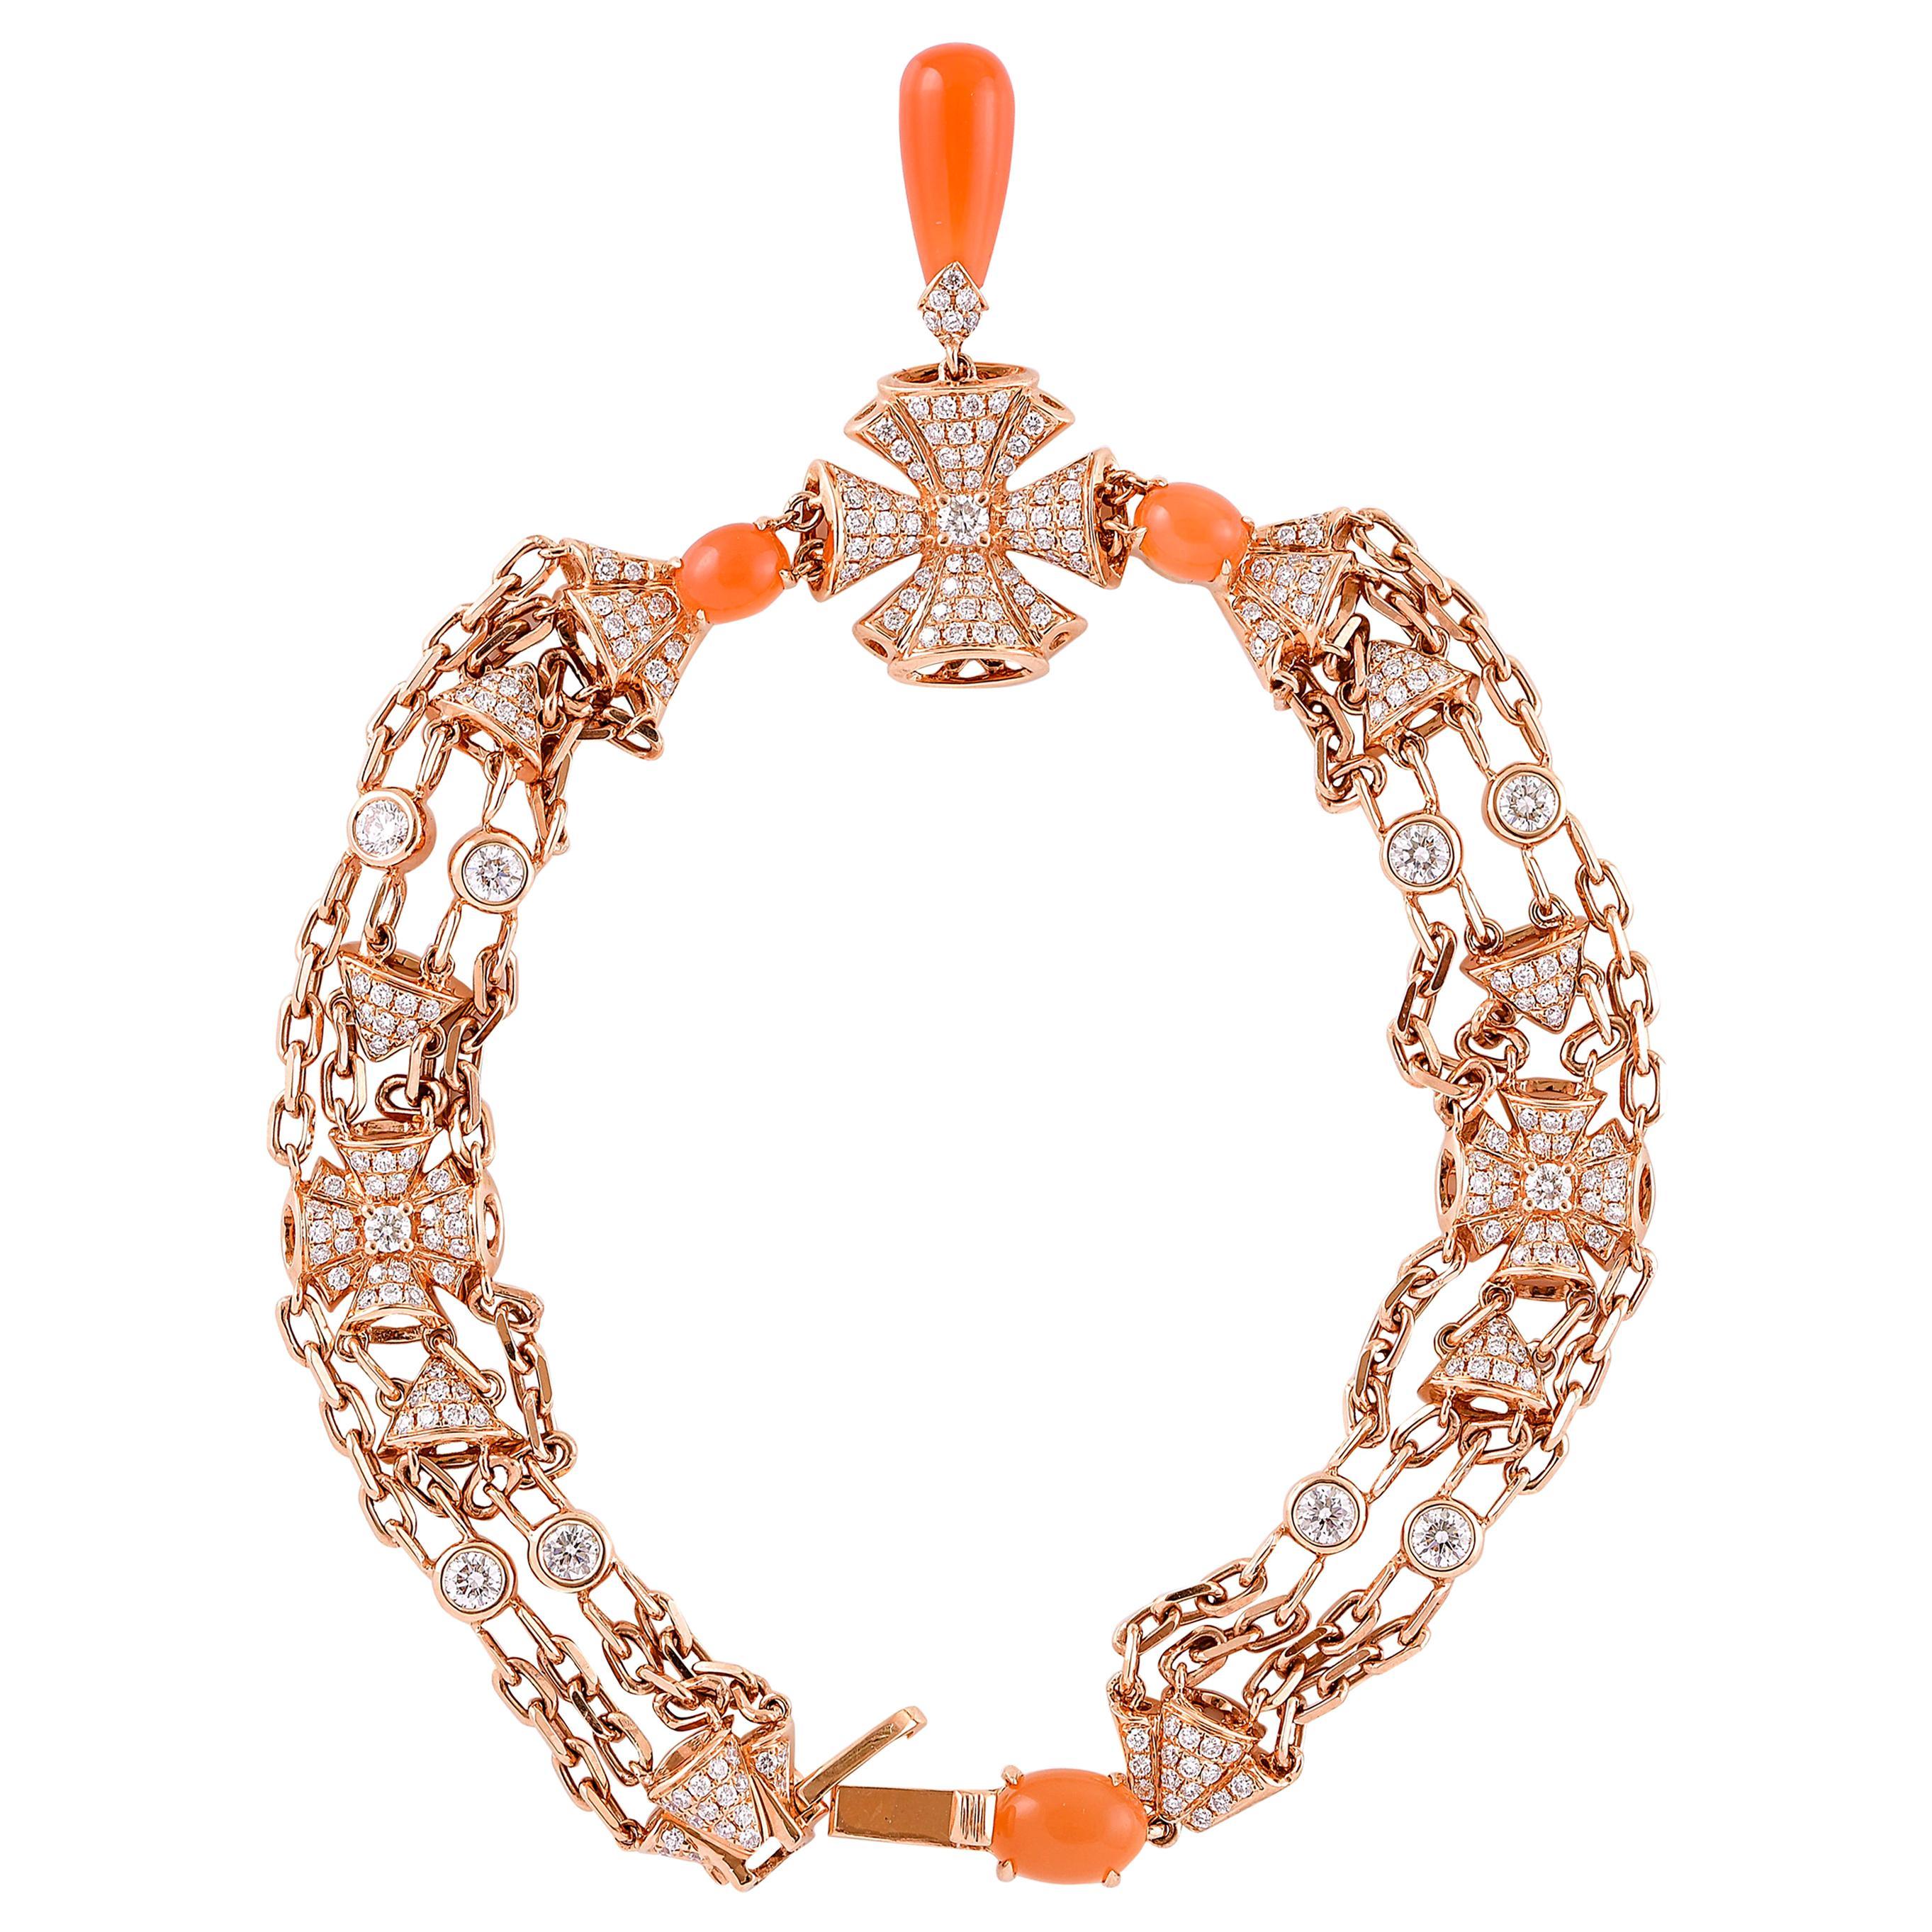 Moonstone Chandelier Bracelet in 18 Karat Rose Gold with Diamonds